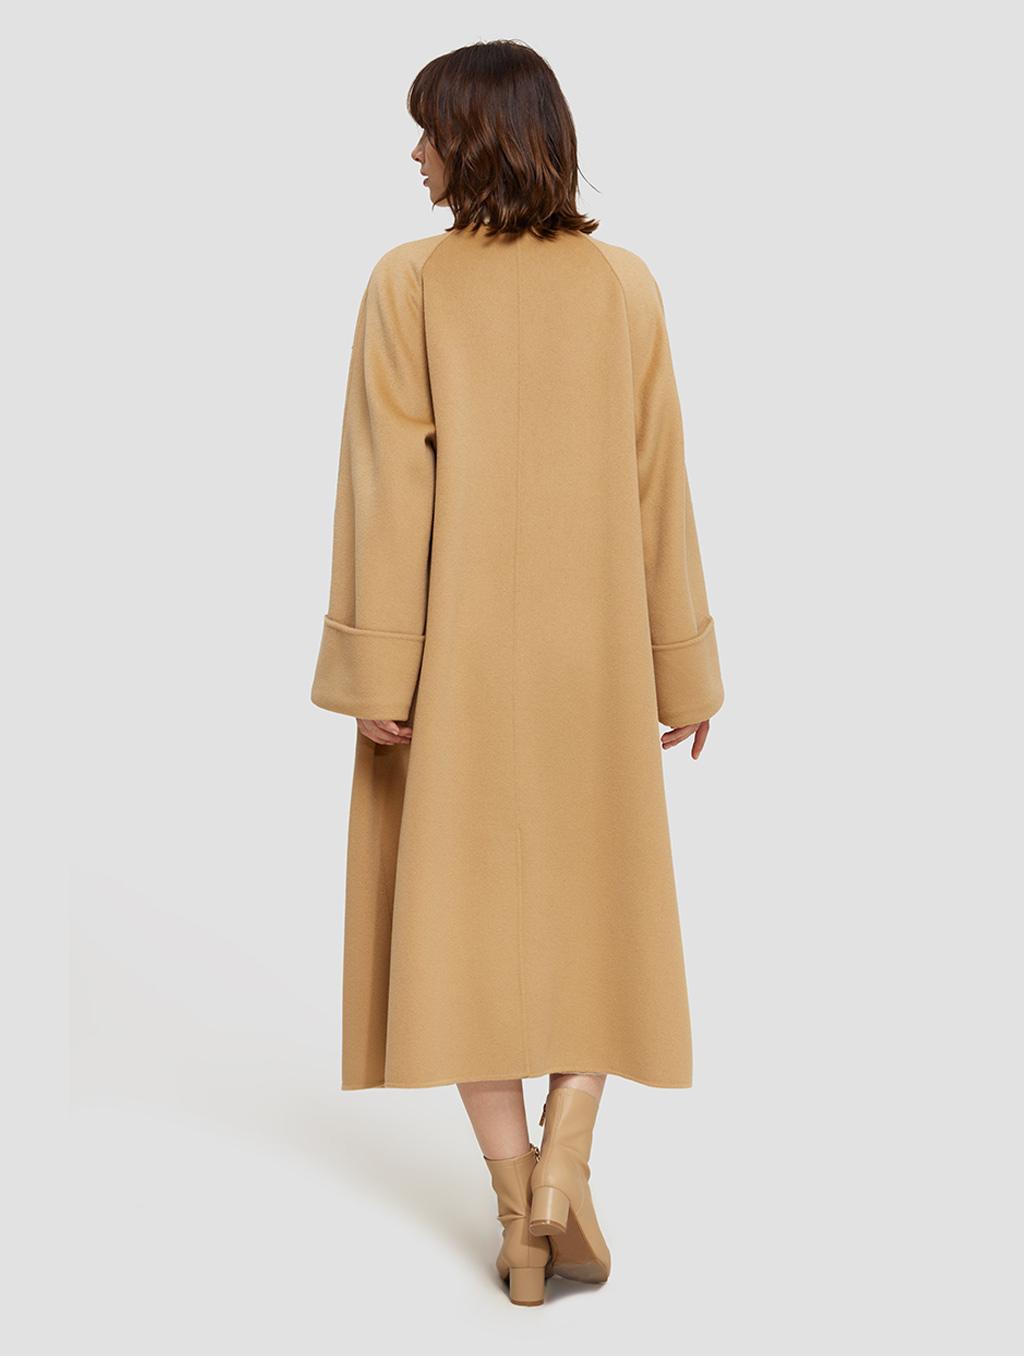 Long Straight Cut Wool Coat- positive-camelLong Straight Cut Wool Coat- back-camel